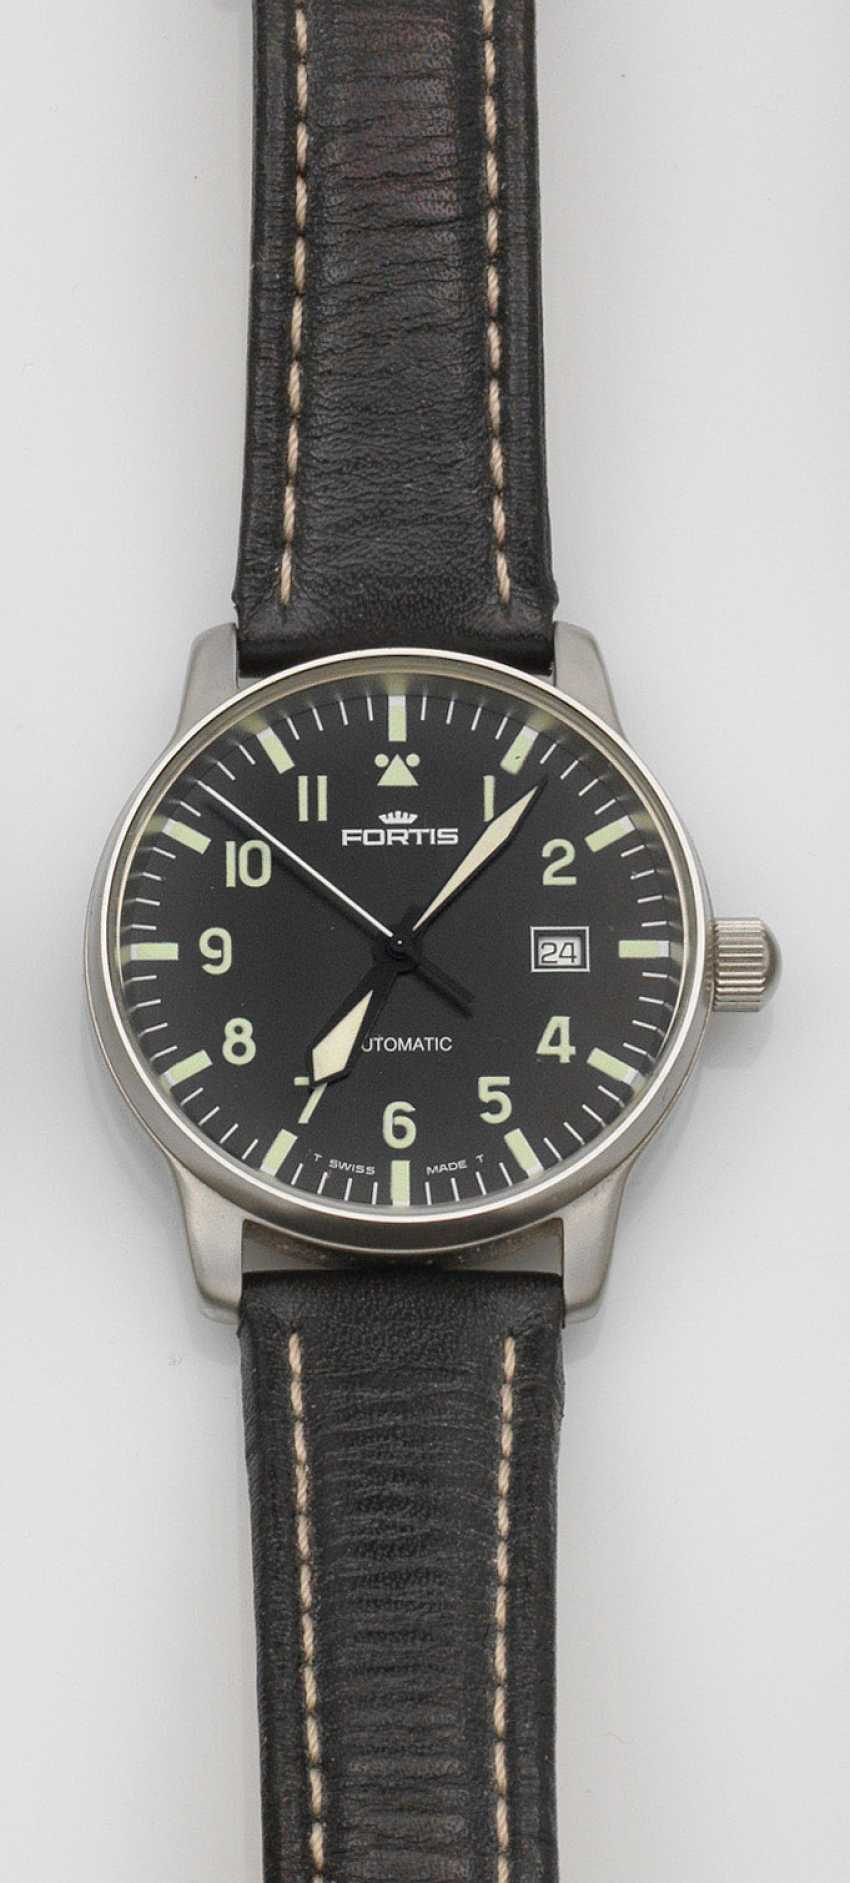 Aviator wrist watch by Fortis - photo 1